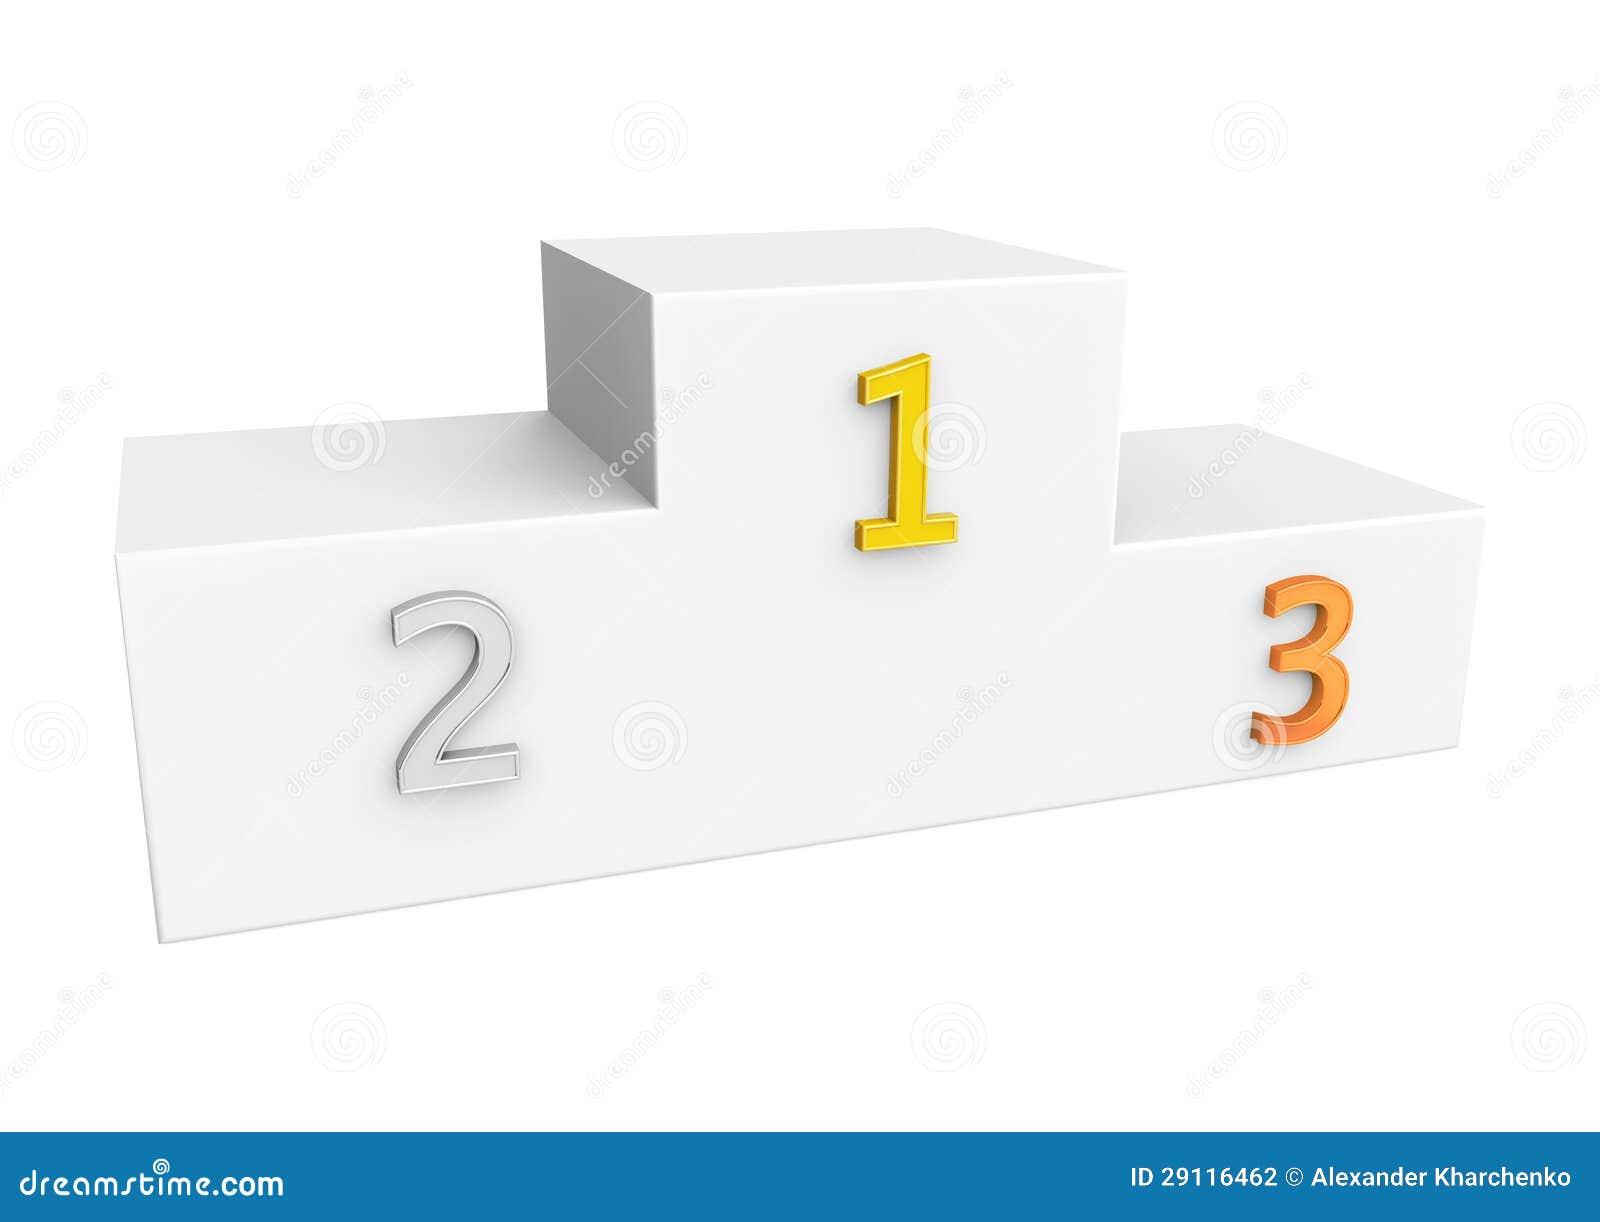 how to make victory podium